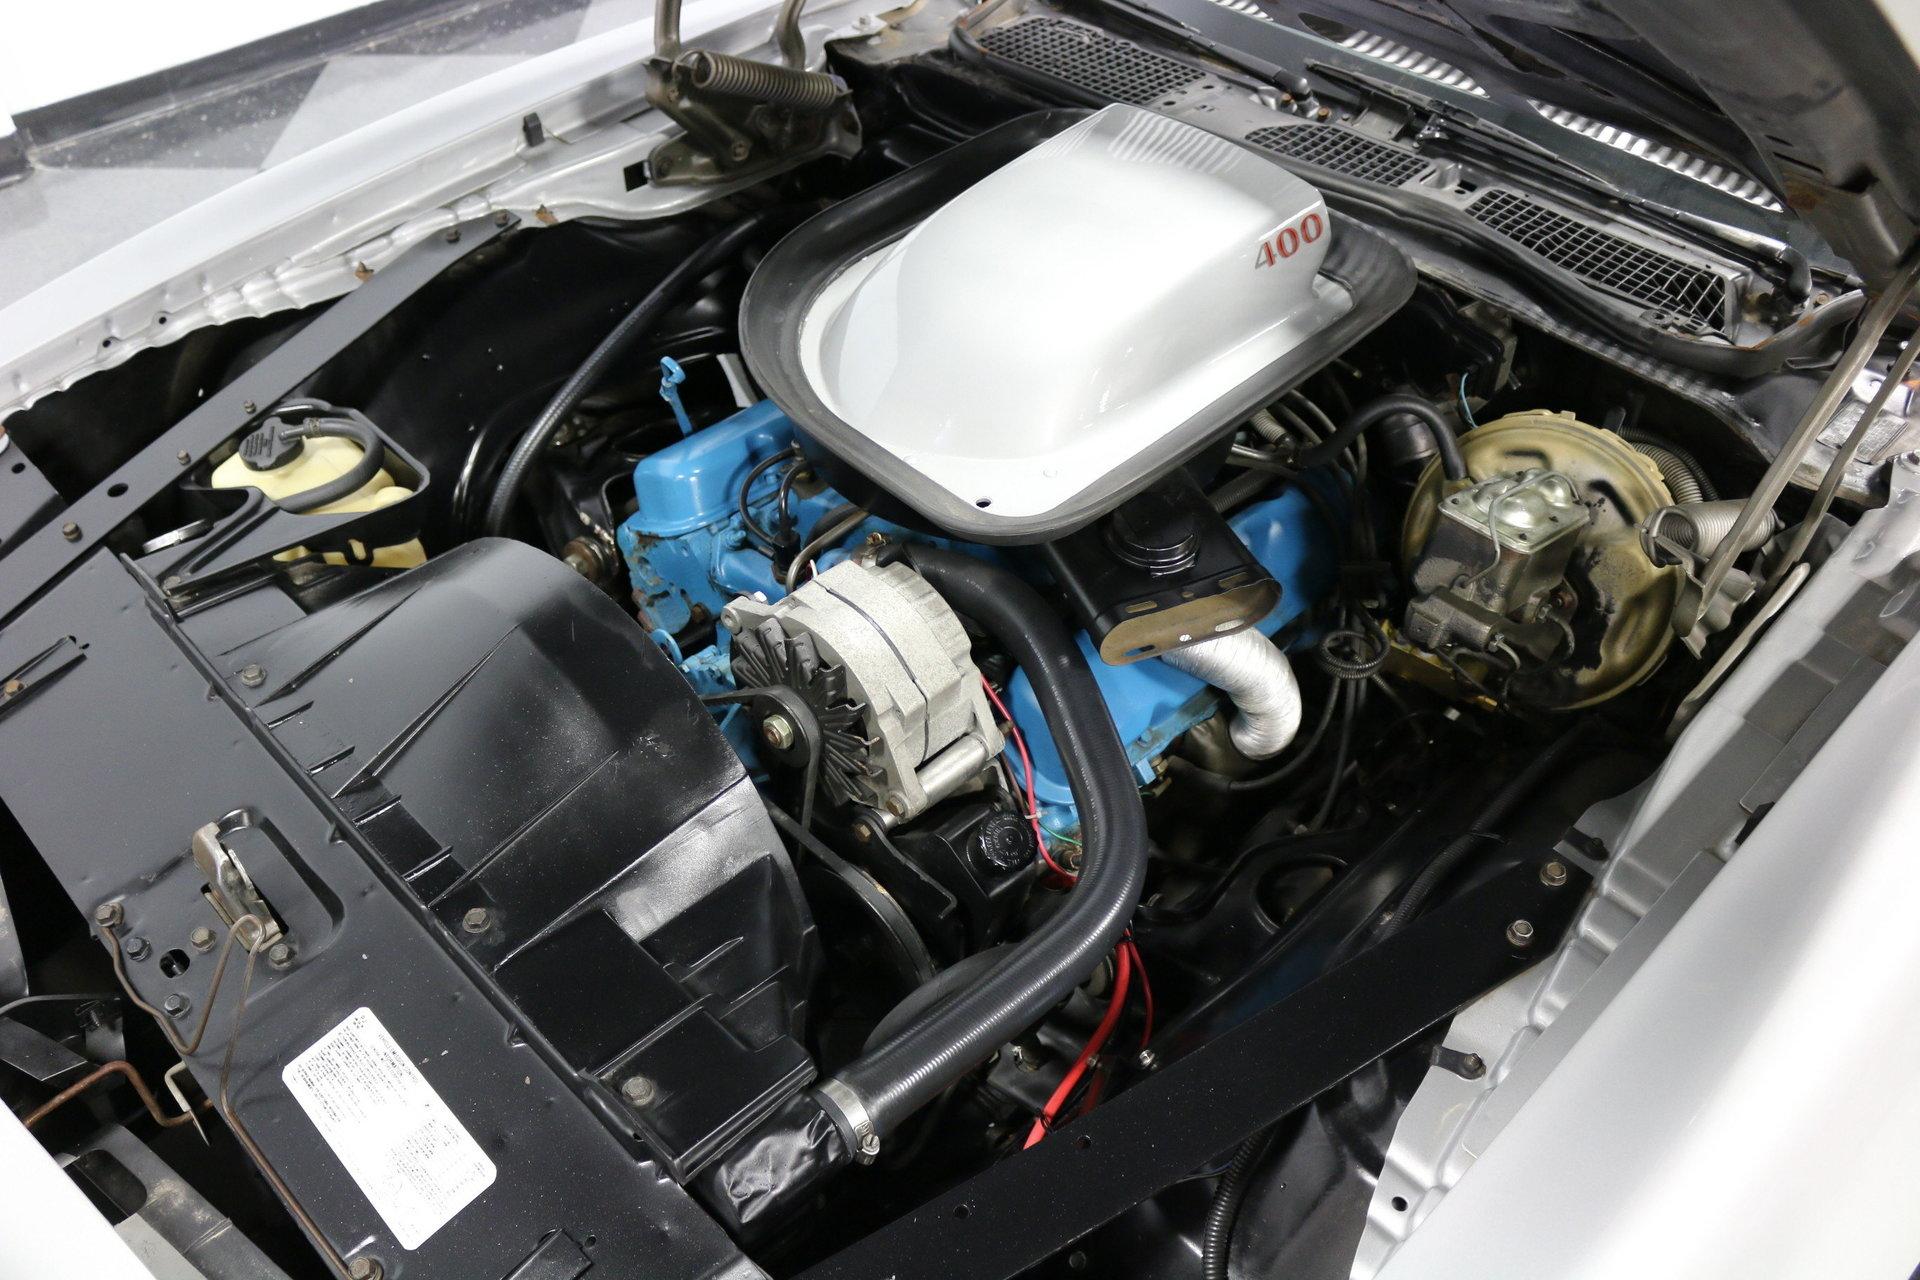 1975 Pontiac Firebird Streetside Classics The Nations Trusted Engine Wiring View 360